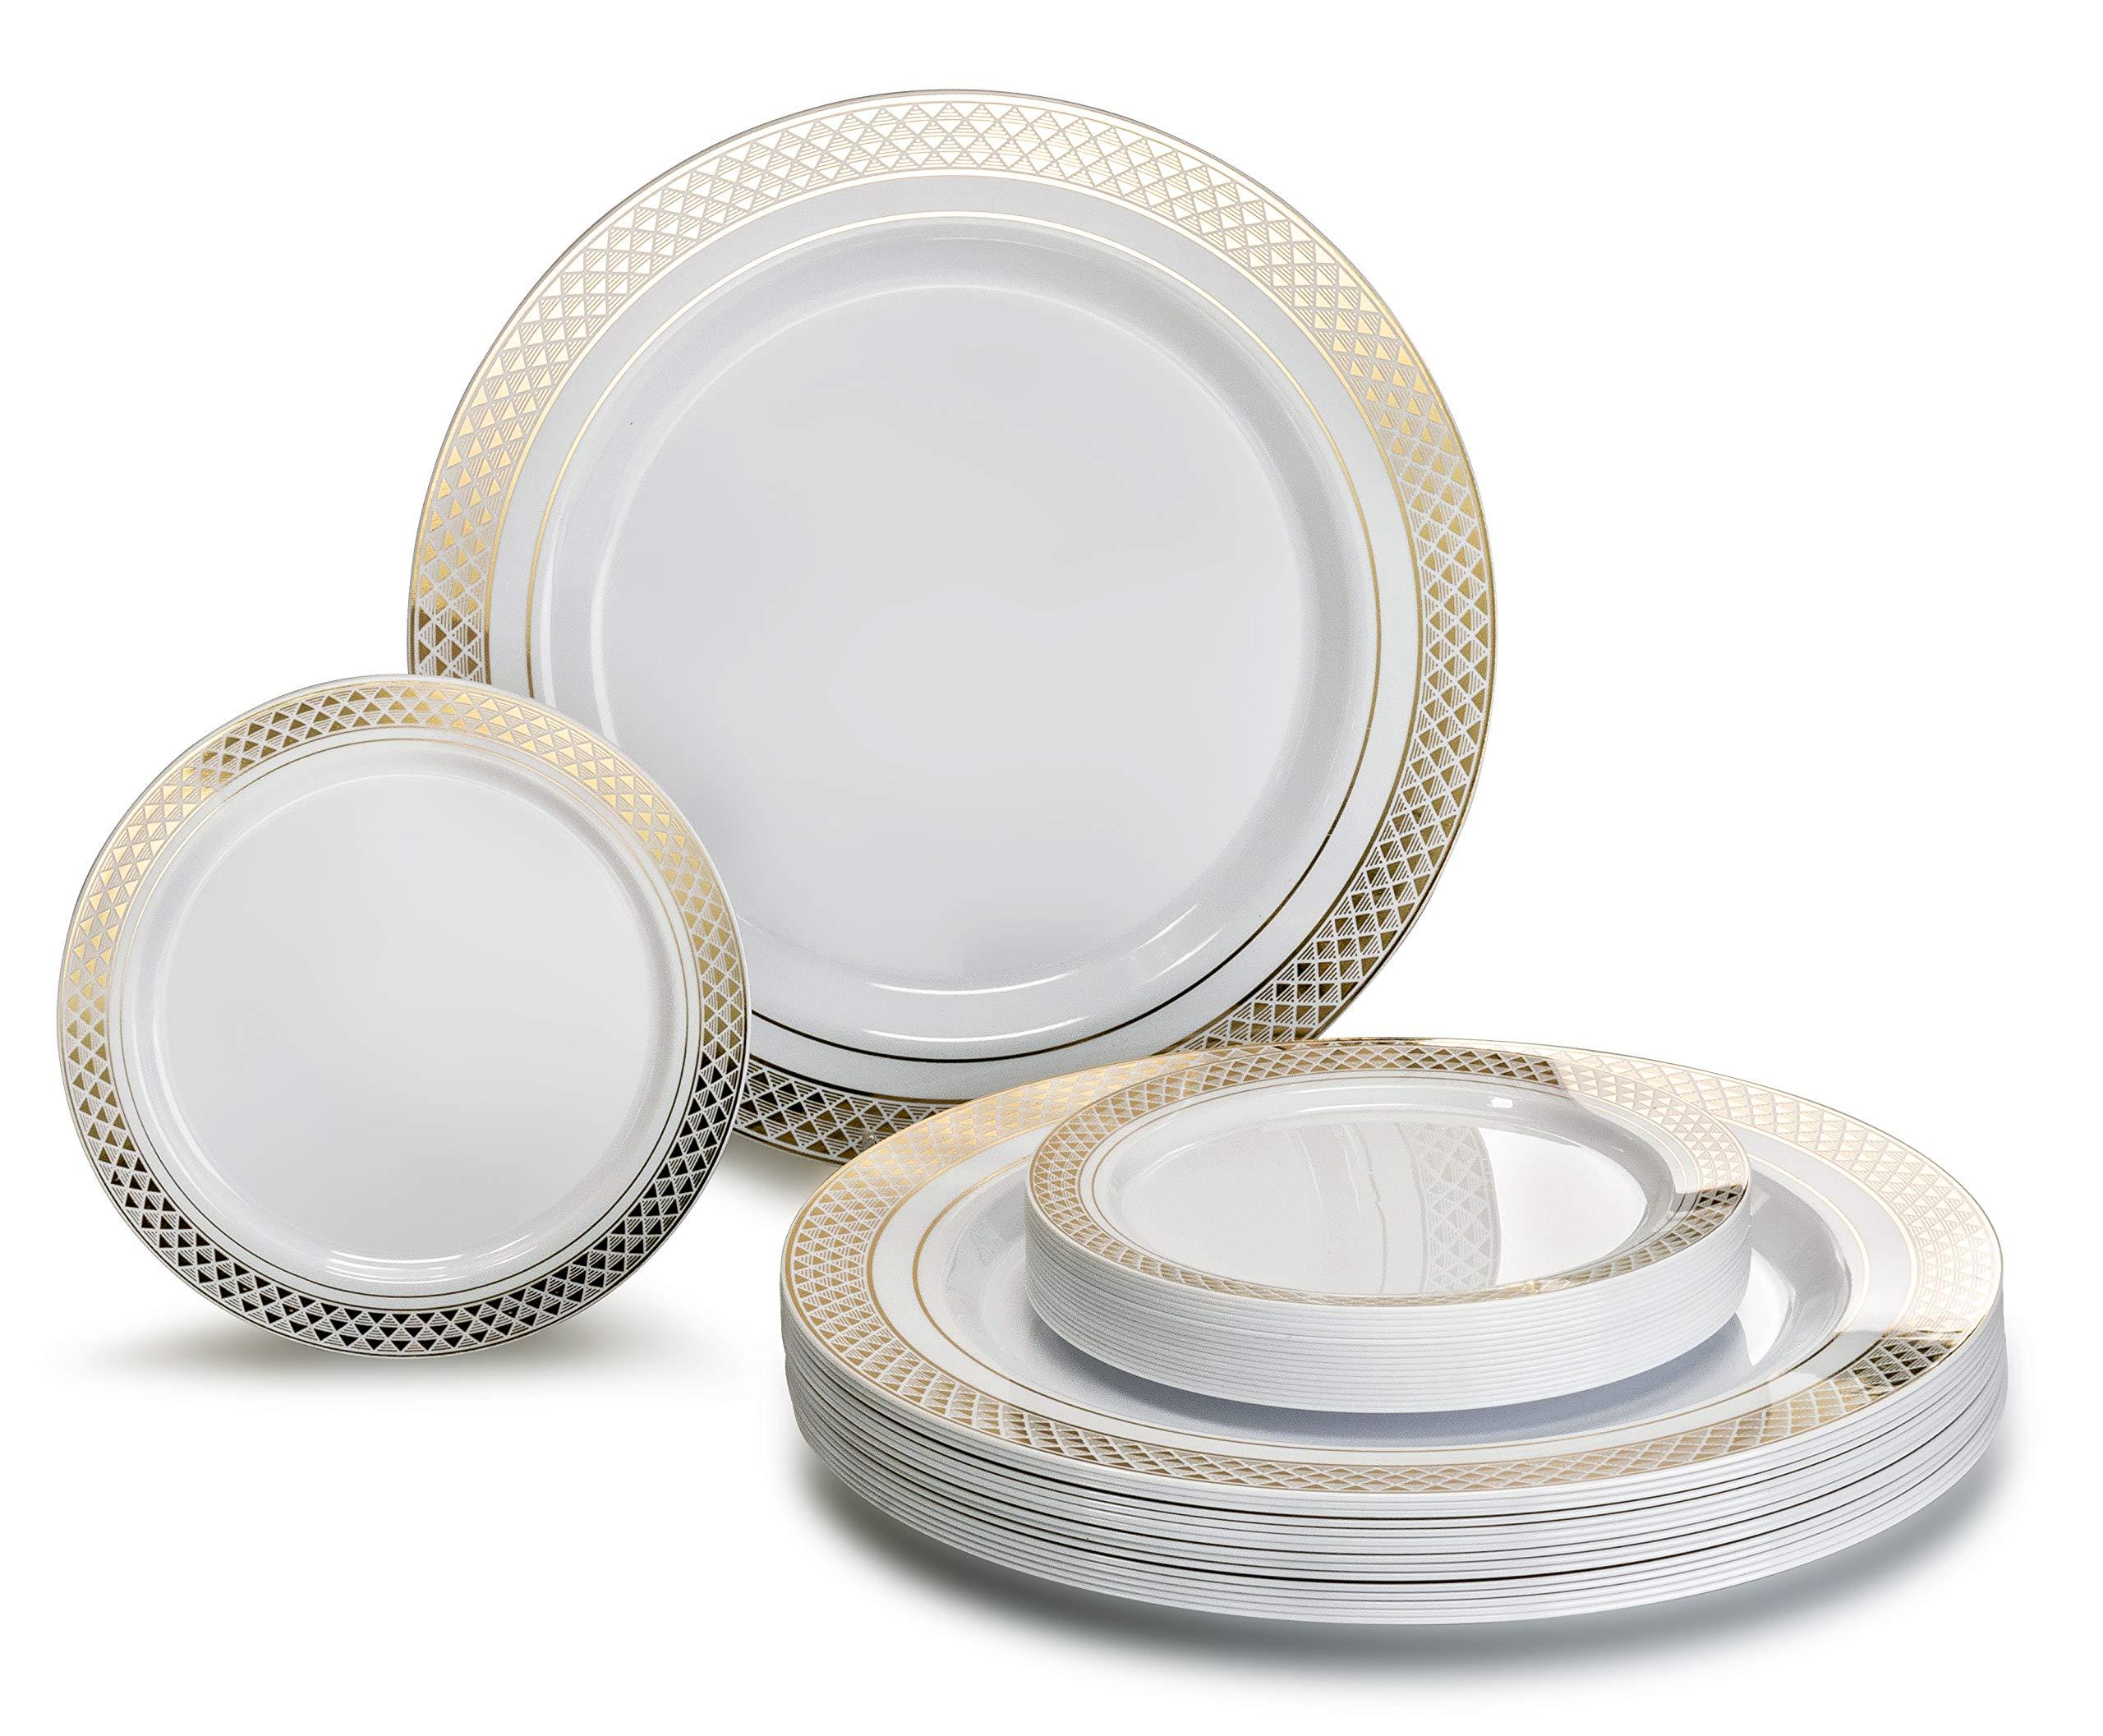 ''OCCASIONS'' 240 Pack, Premium Disposable Plastic plates, 120 x 10.5'' Dinner + 120 x 6'' Cake plates (Celebration White/Gold)